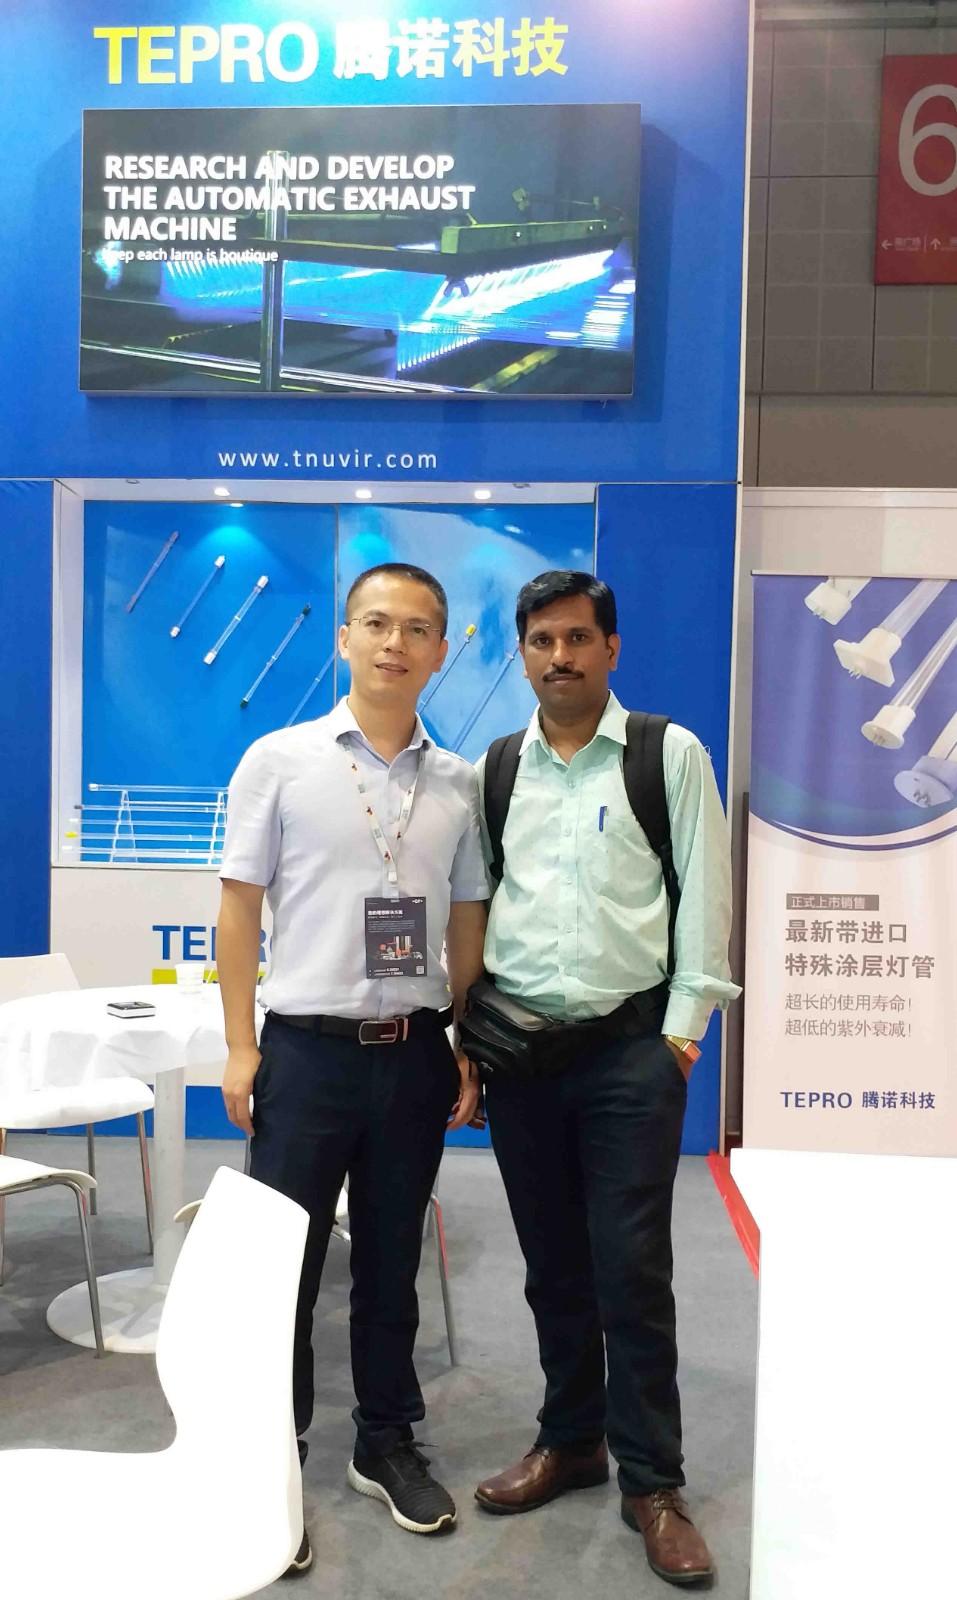 Tepro-Aquatech China Environment 2019 In Shanghai, Tepro china Co, Ltd-3